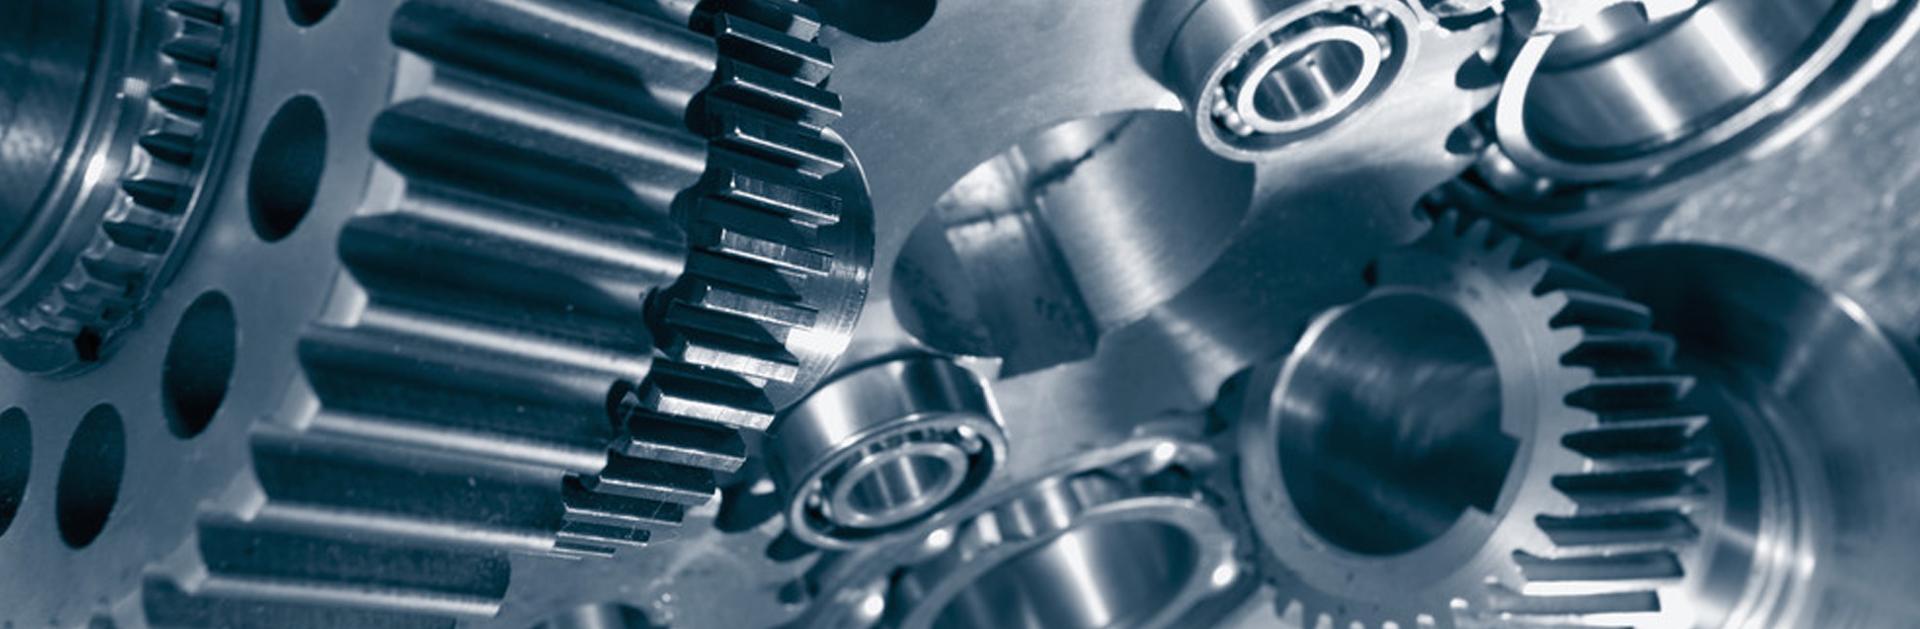 Die Casting Machinery Parts - Custom Machinery Parts